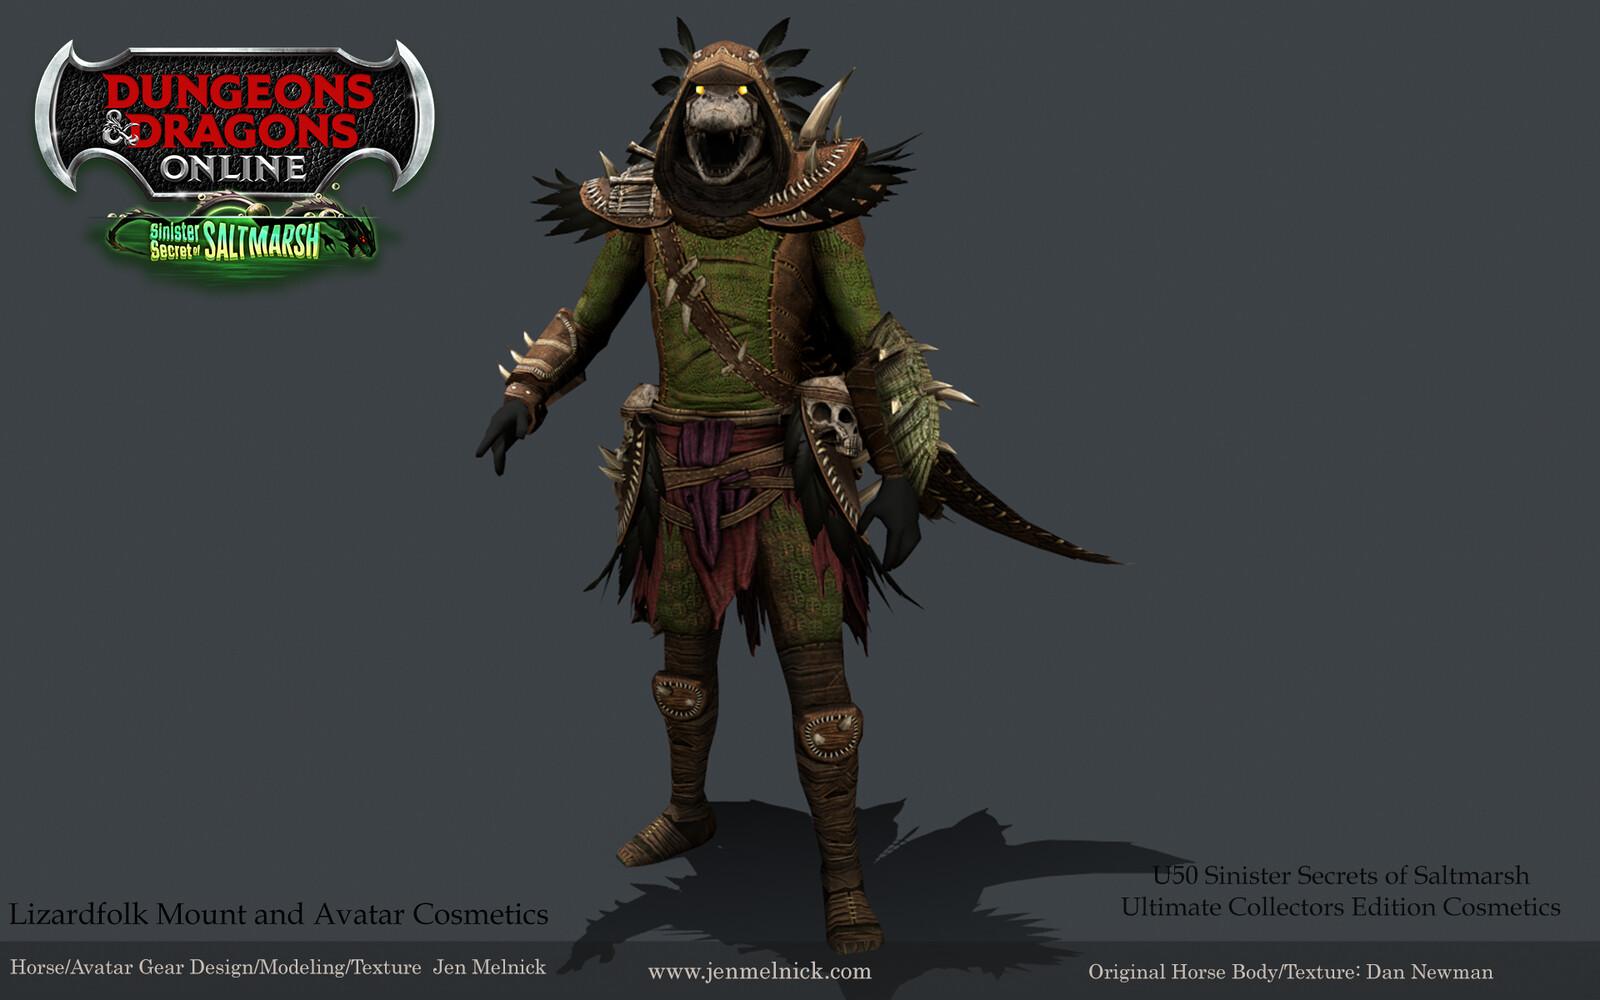 Dungeons and Dragons Online Lizardfolk Cosmetic Set: Jumpsuit, Cloak, Helmet, and Gearset Sinister Secrets of Saltmarsh Mini-Expansion  Ultimate Fan Bundle Reward Marmoset Render